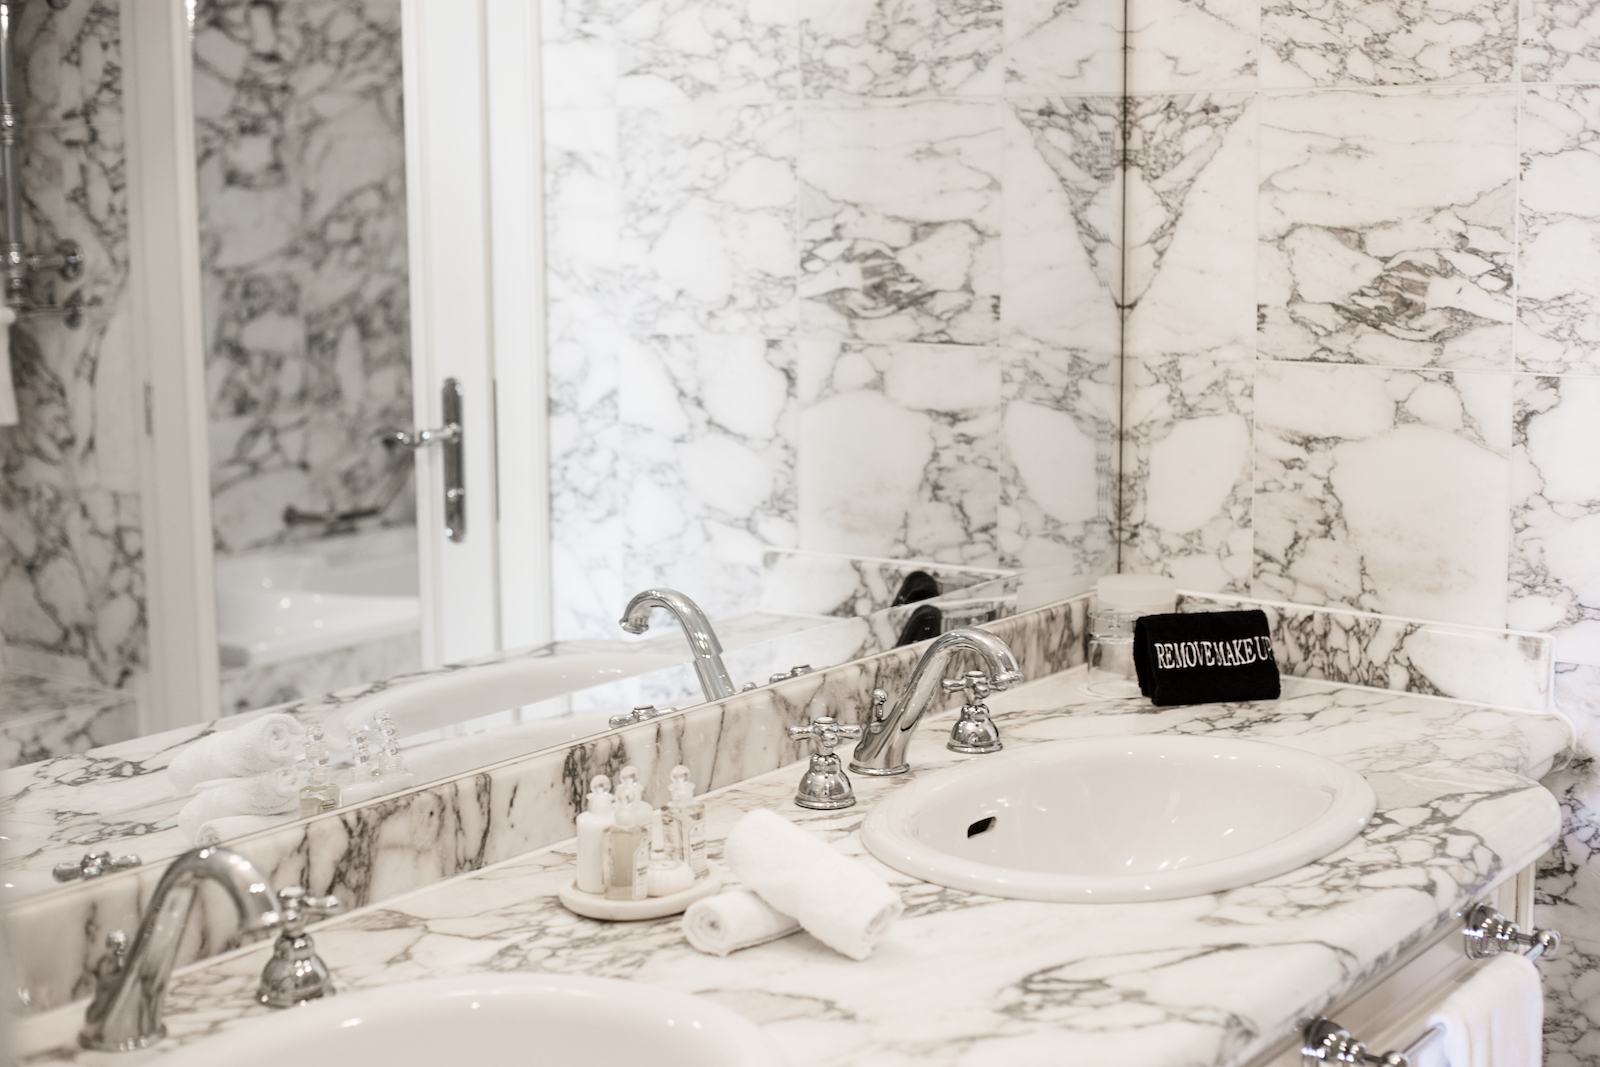 villa-belrose-althoff-hotel-st-tropez-livia-auer-IMG_5556